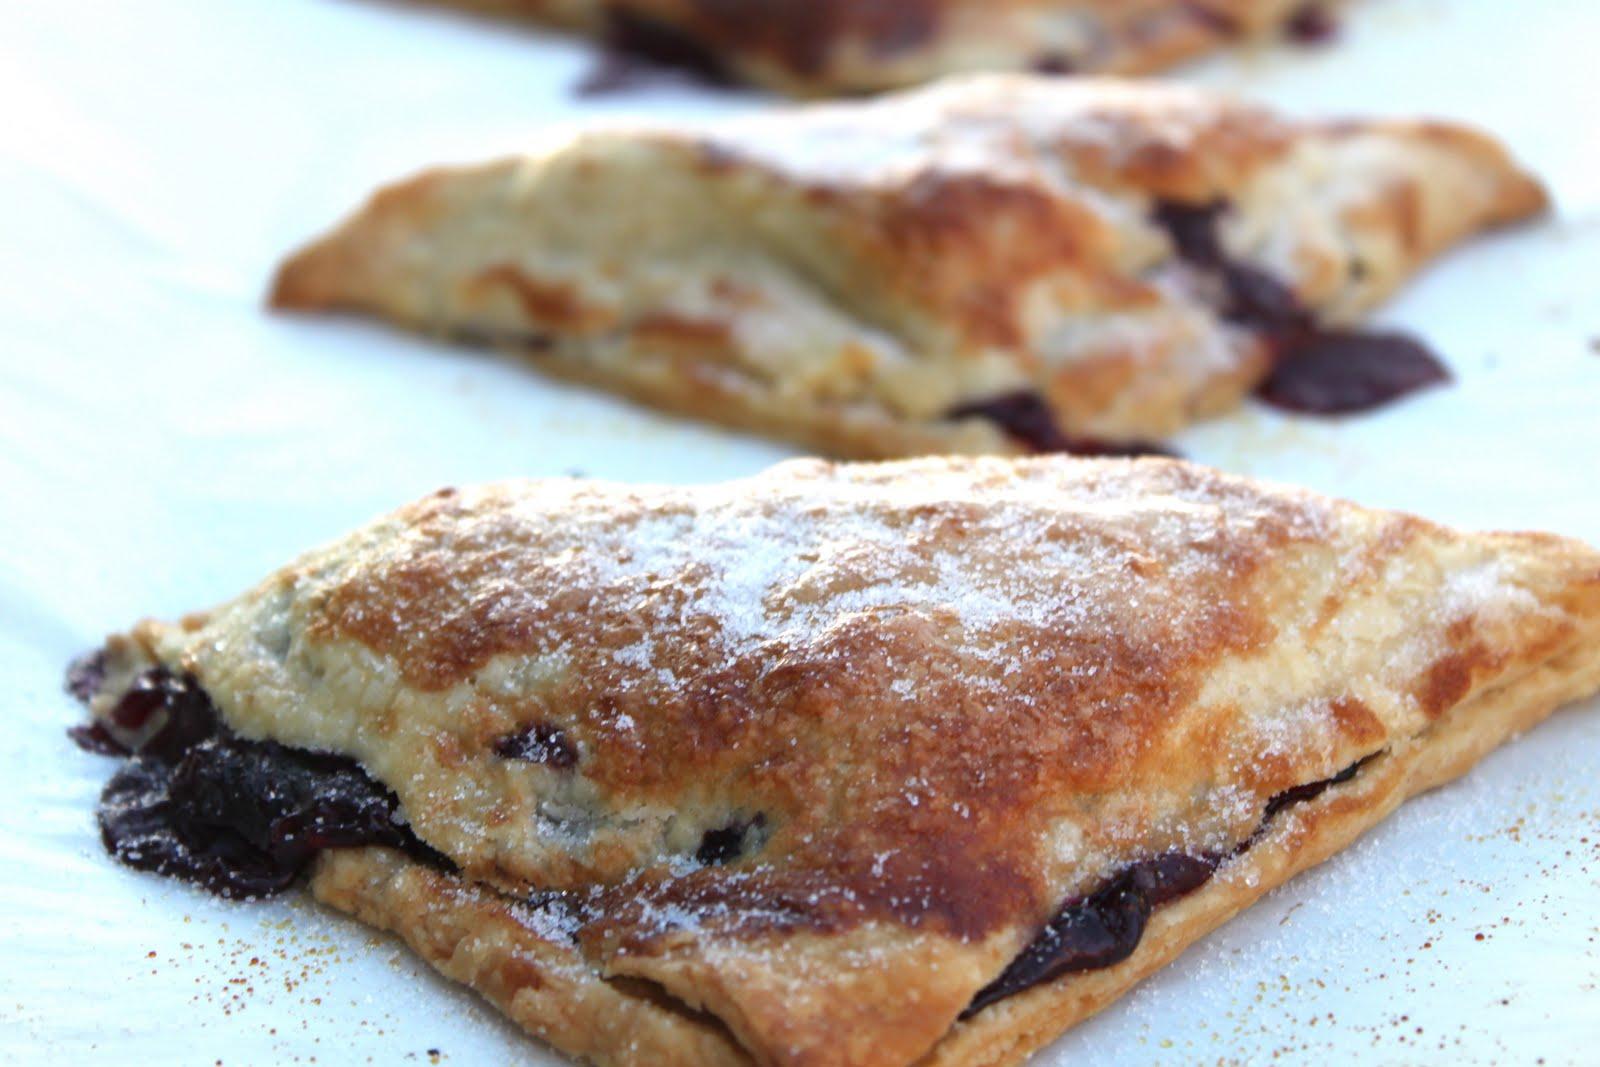 ... Jelebi Images PHotos Wallpapers : Dessert Recipe Blackberry Slump